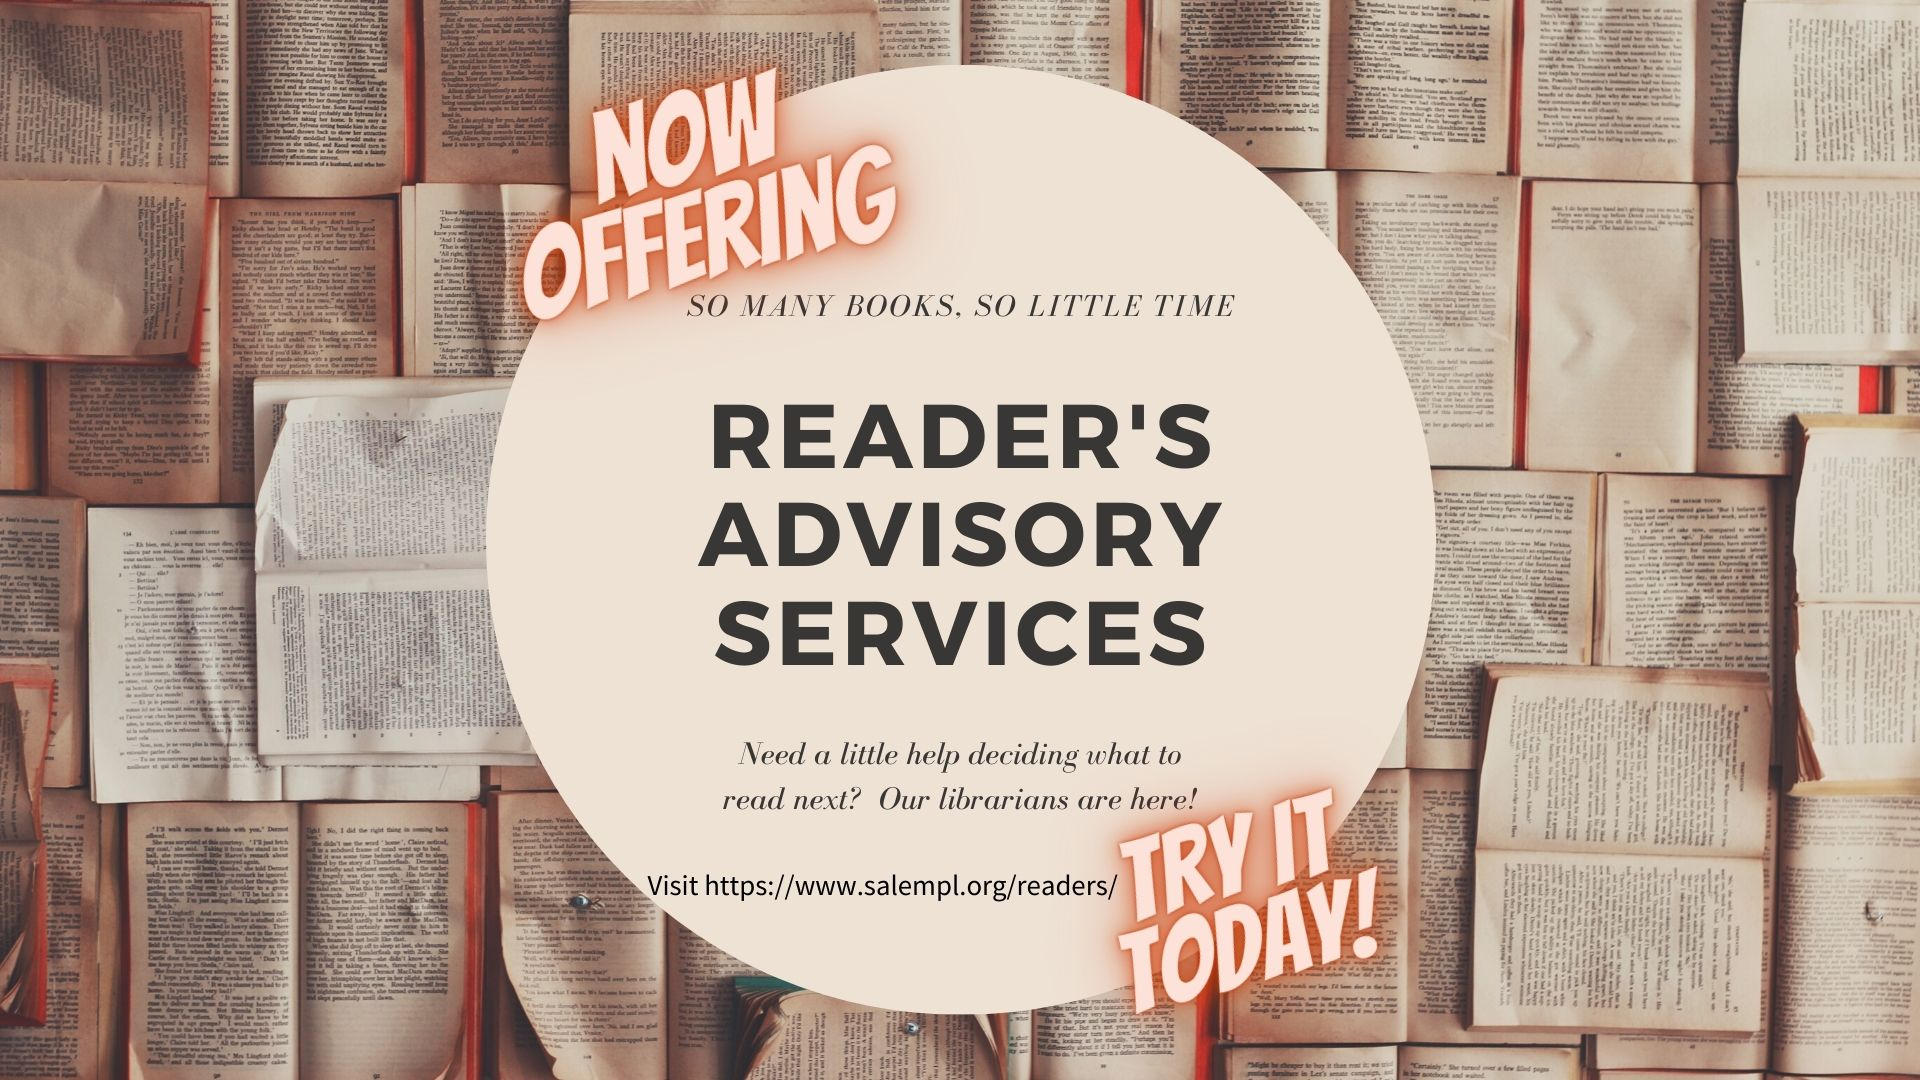 Reader's Advisory Services